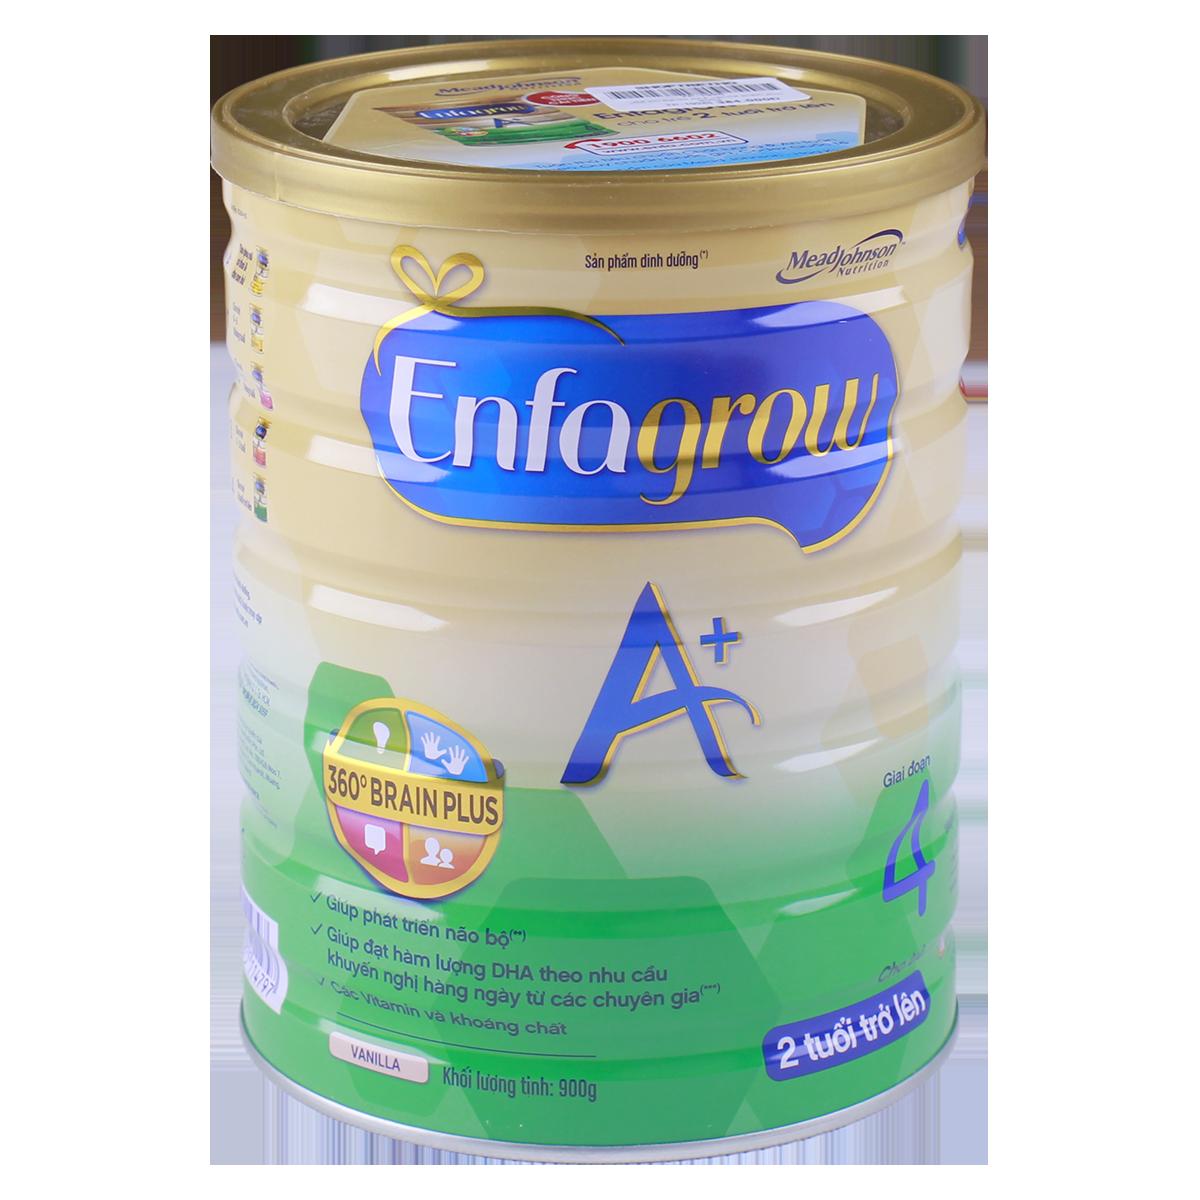 Sua Enfagrow A+ 4 vanilla 360 Brain Plus